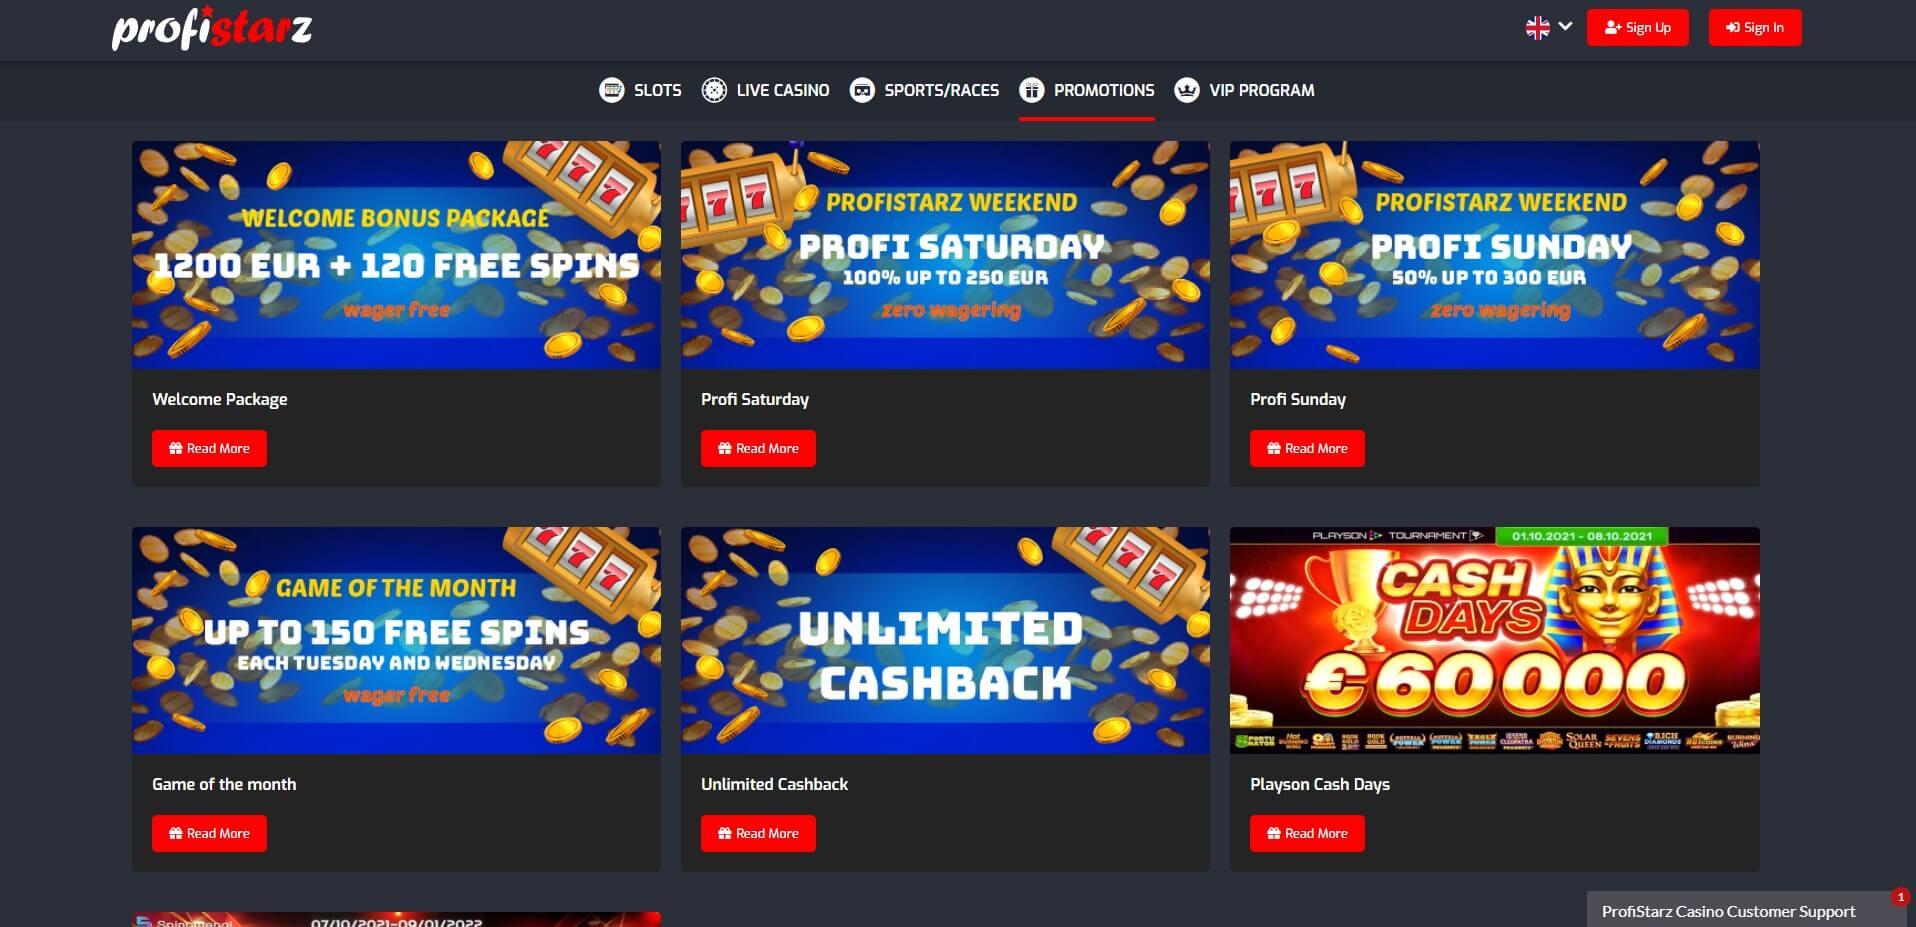 Promotions at Profistarz Casino